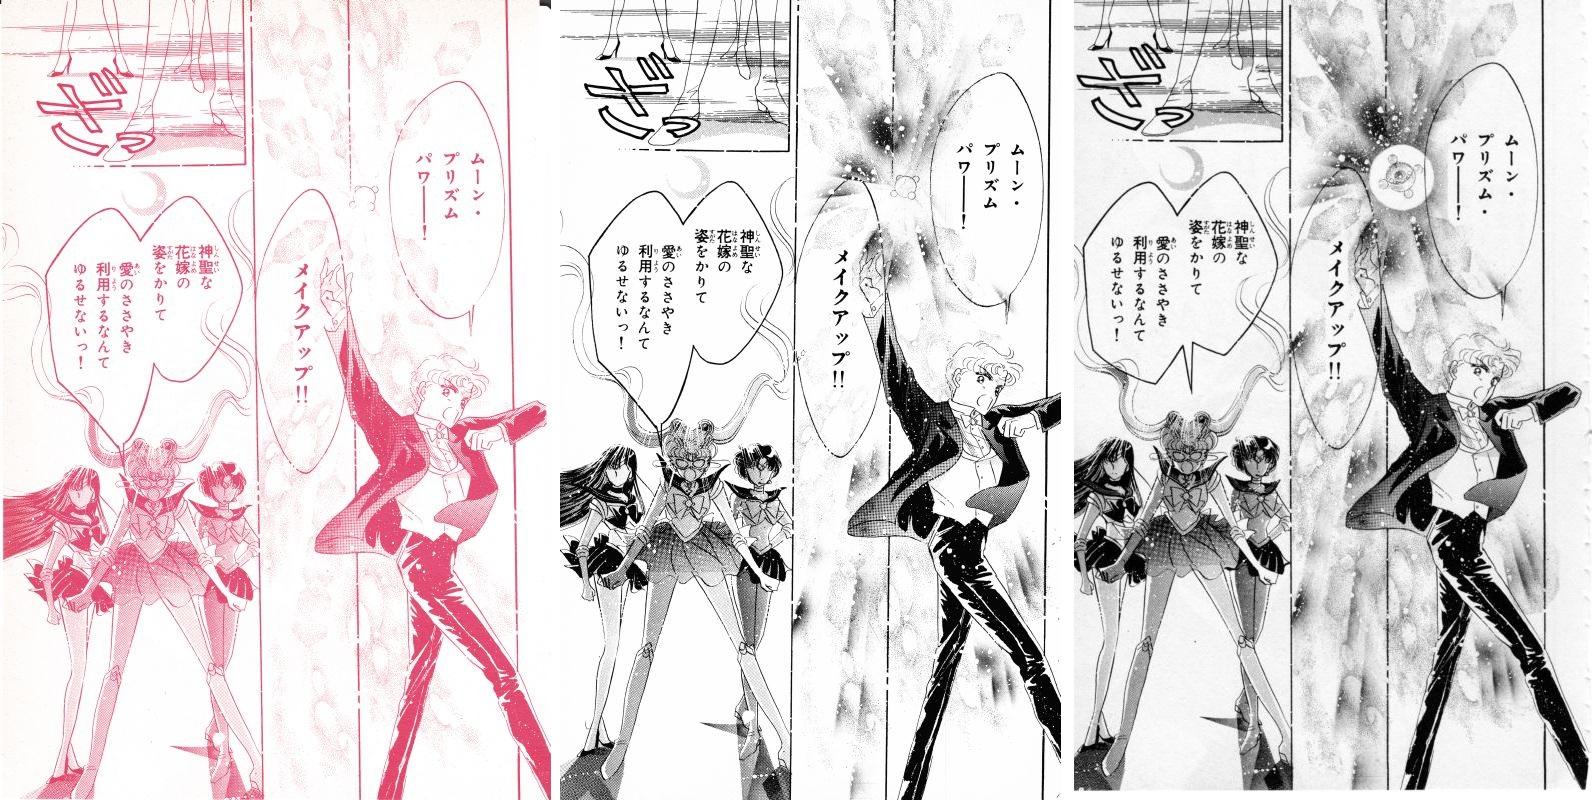 Act 5, Page 21 – Nakayoshi, Original, Remaster